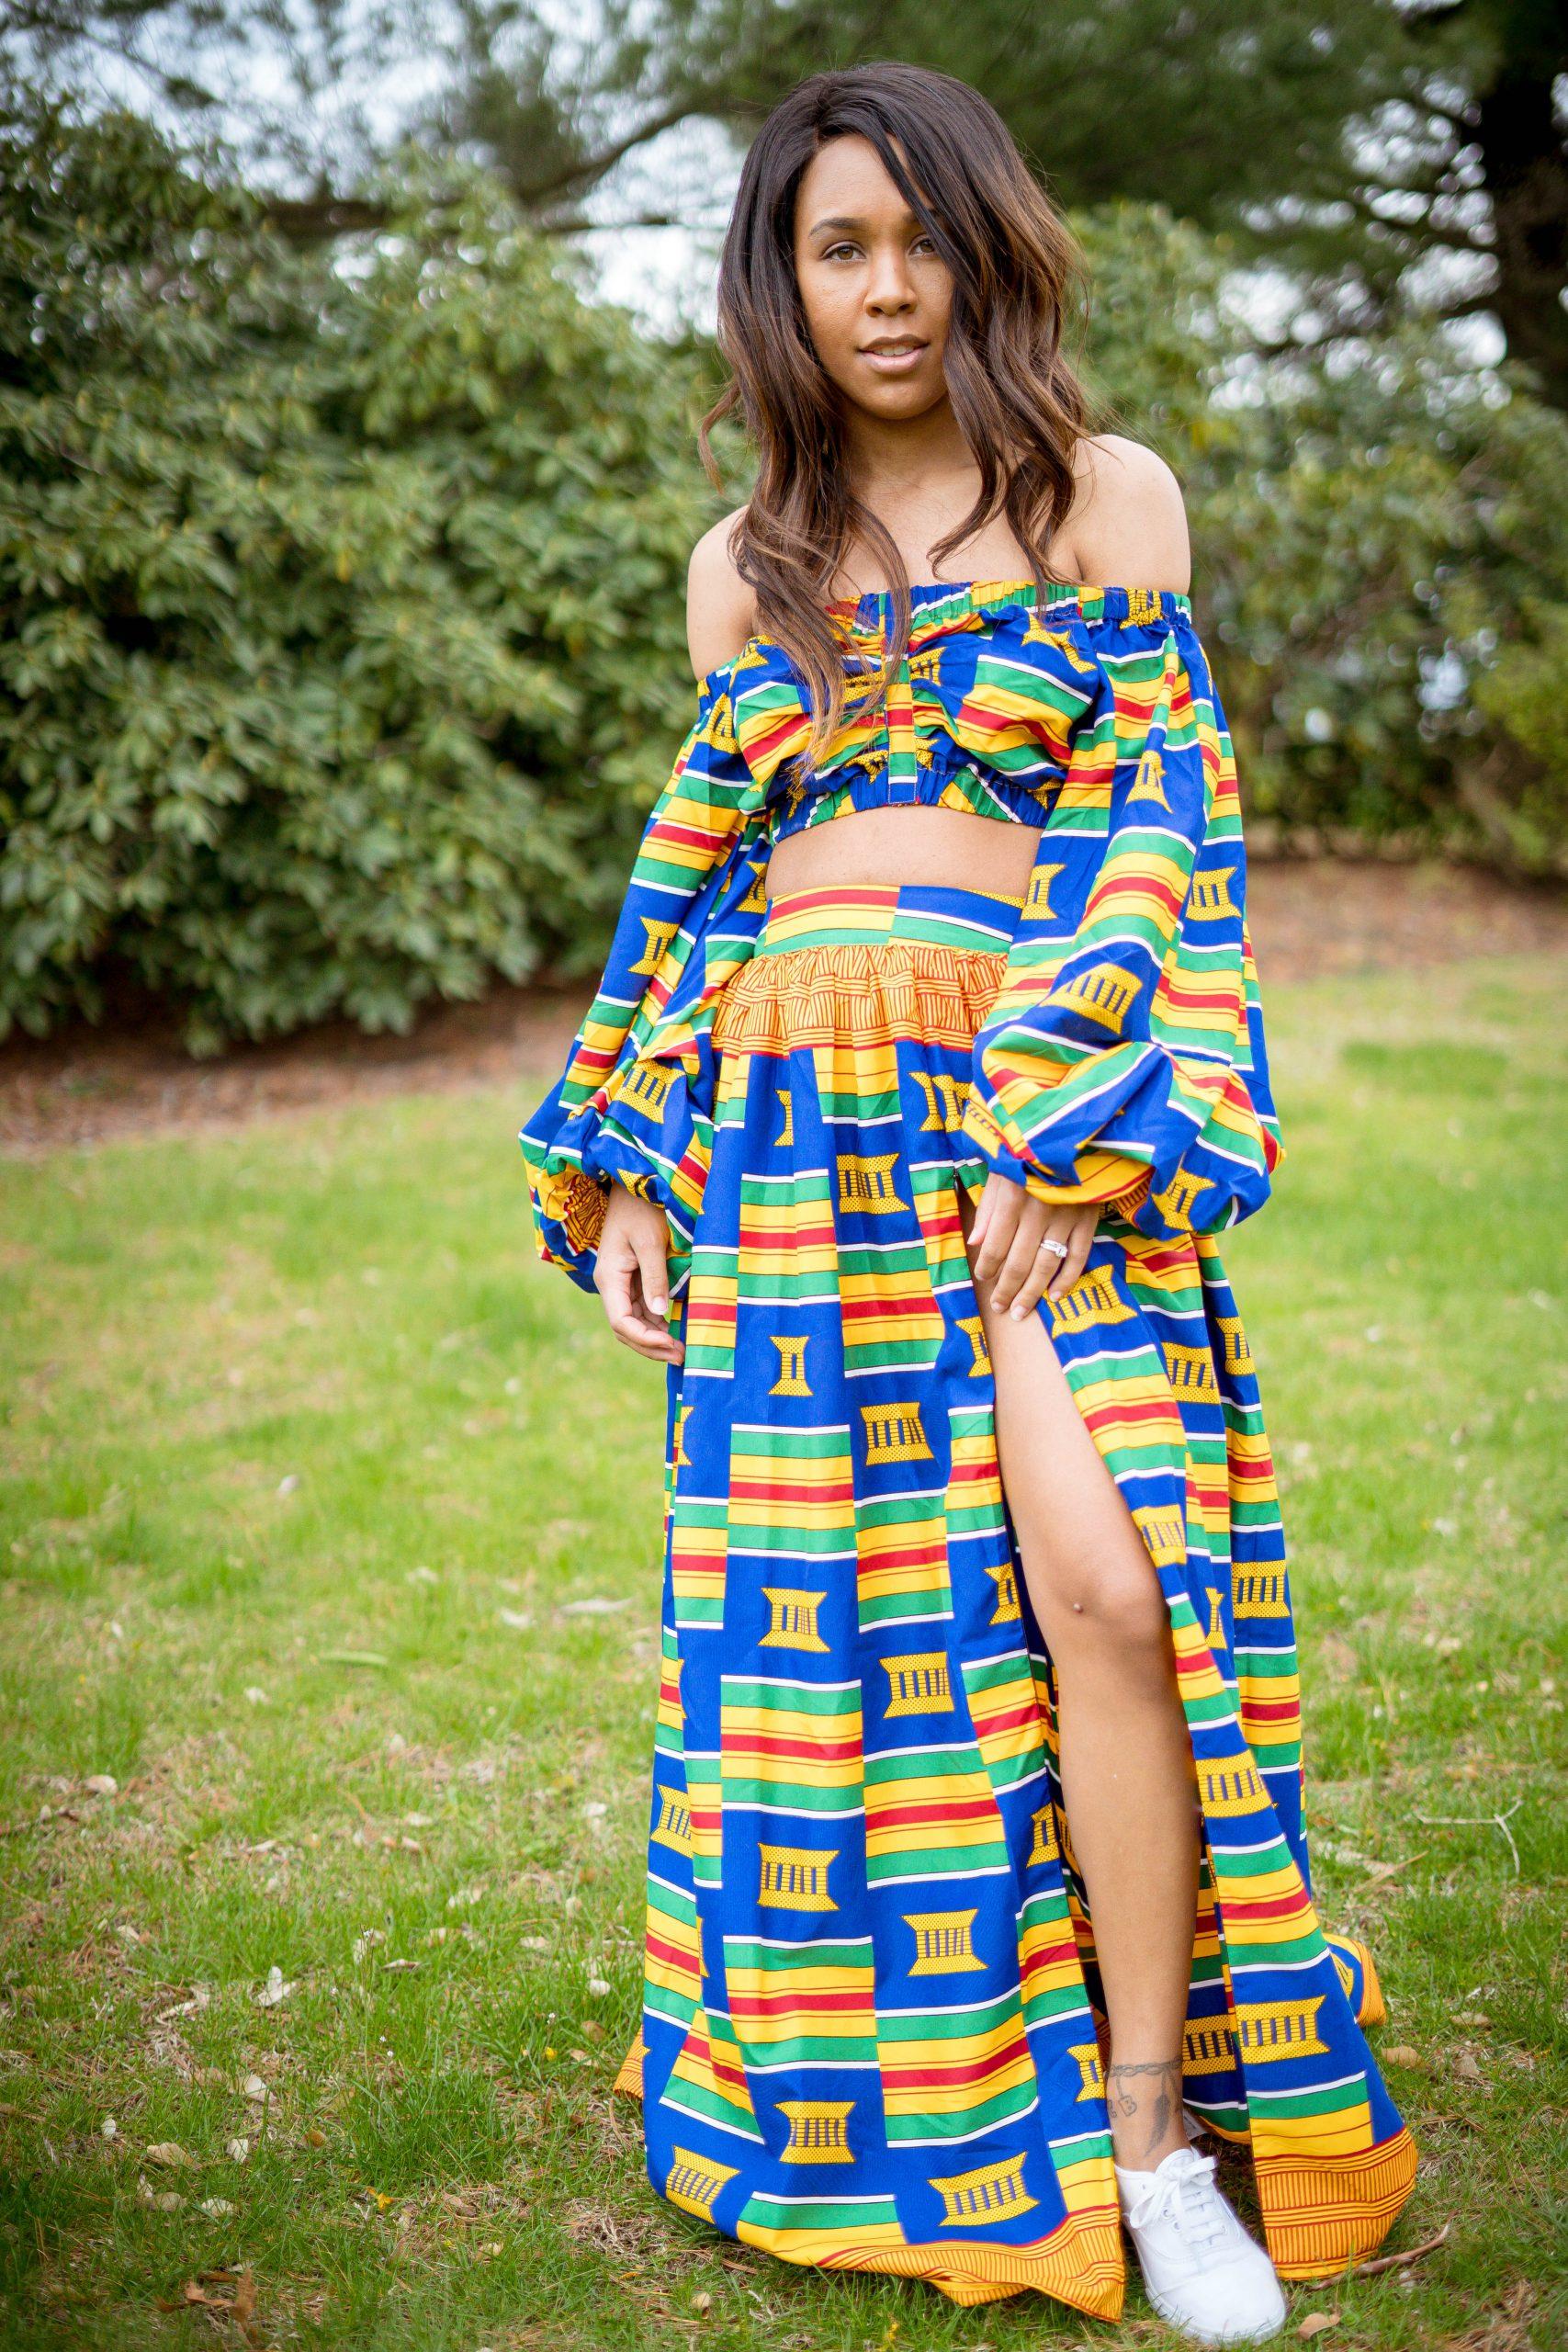 LivingLesh lifestyle blogger showcasing an African print two piece set